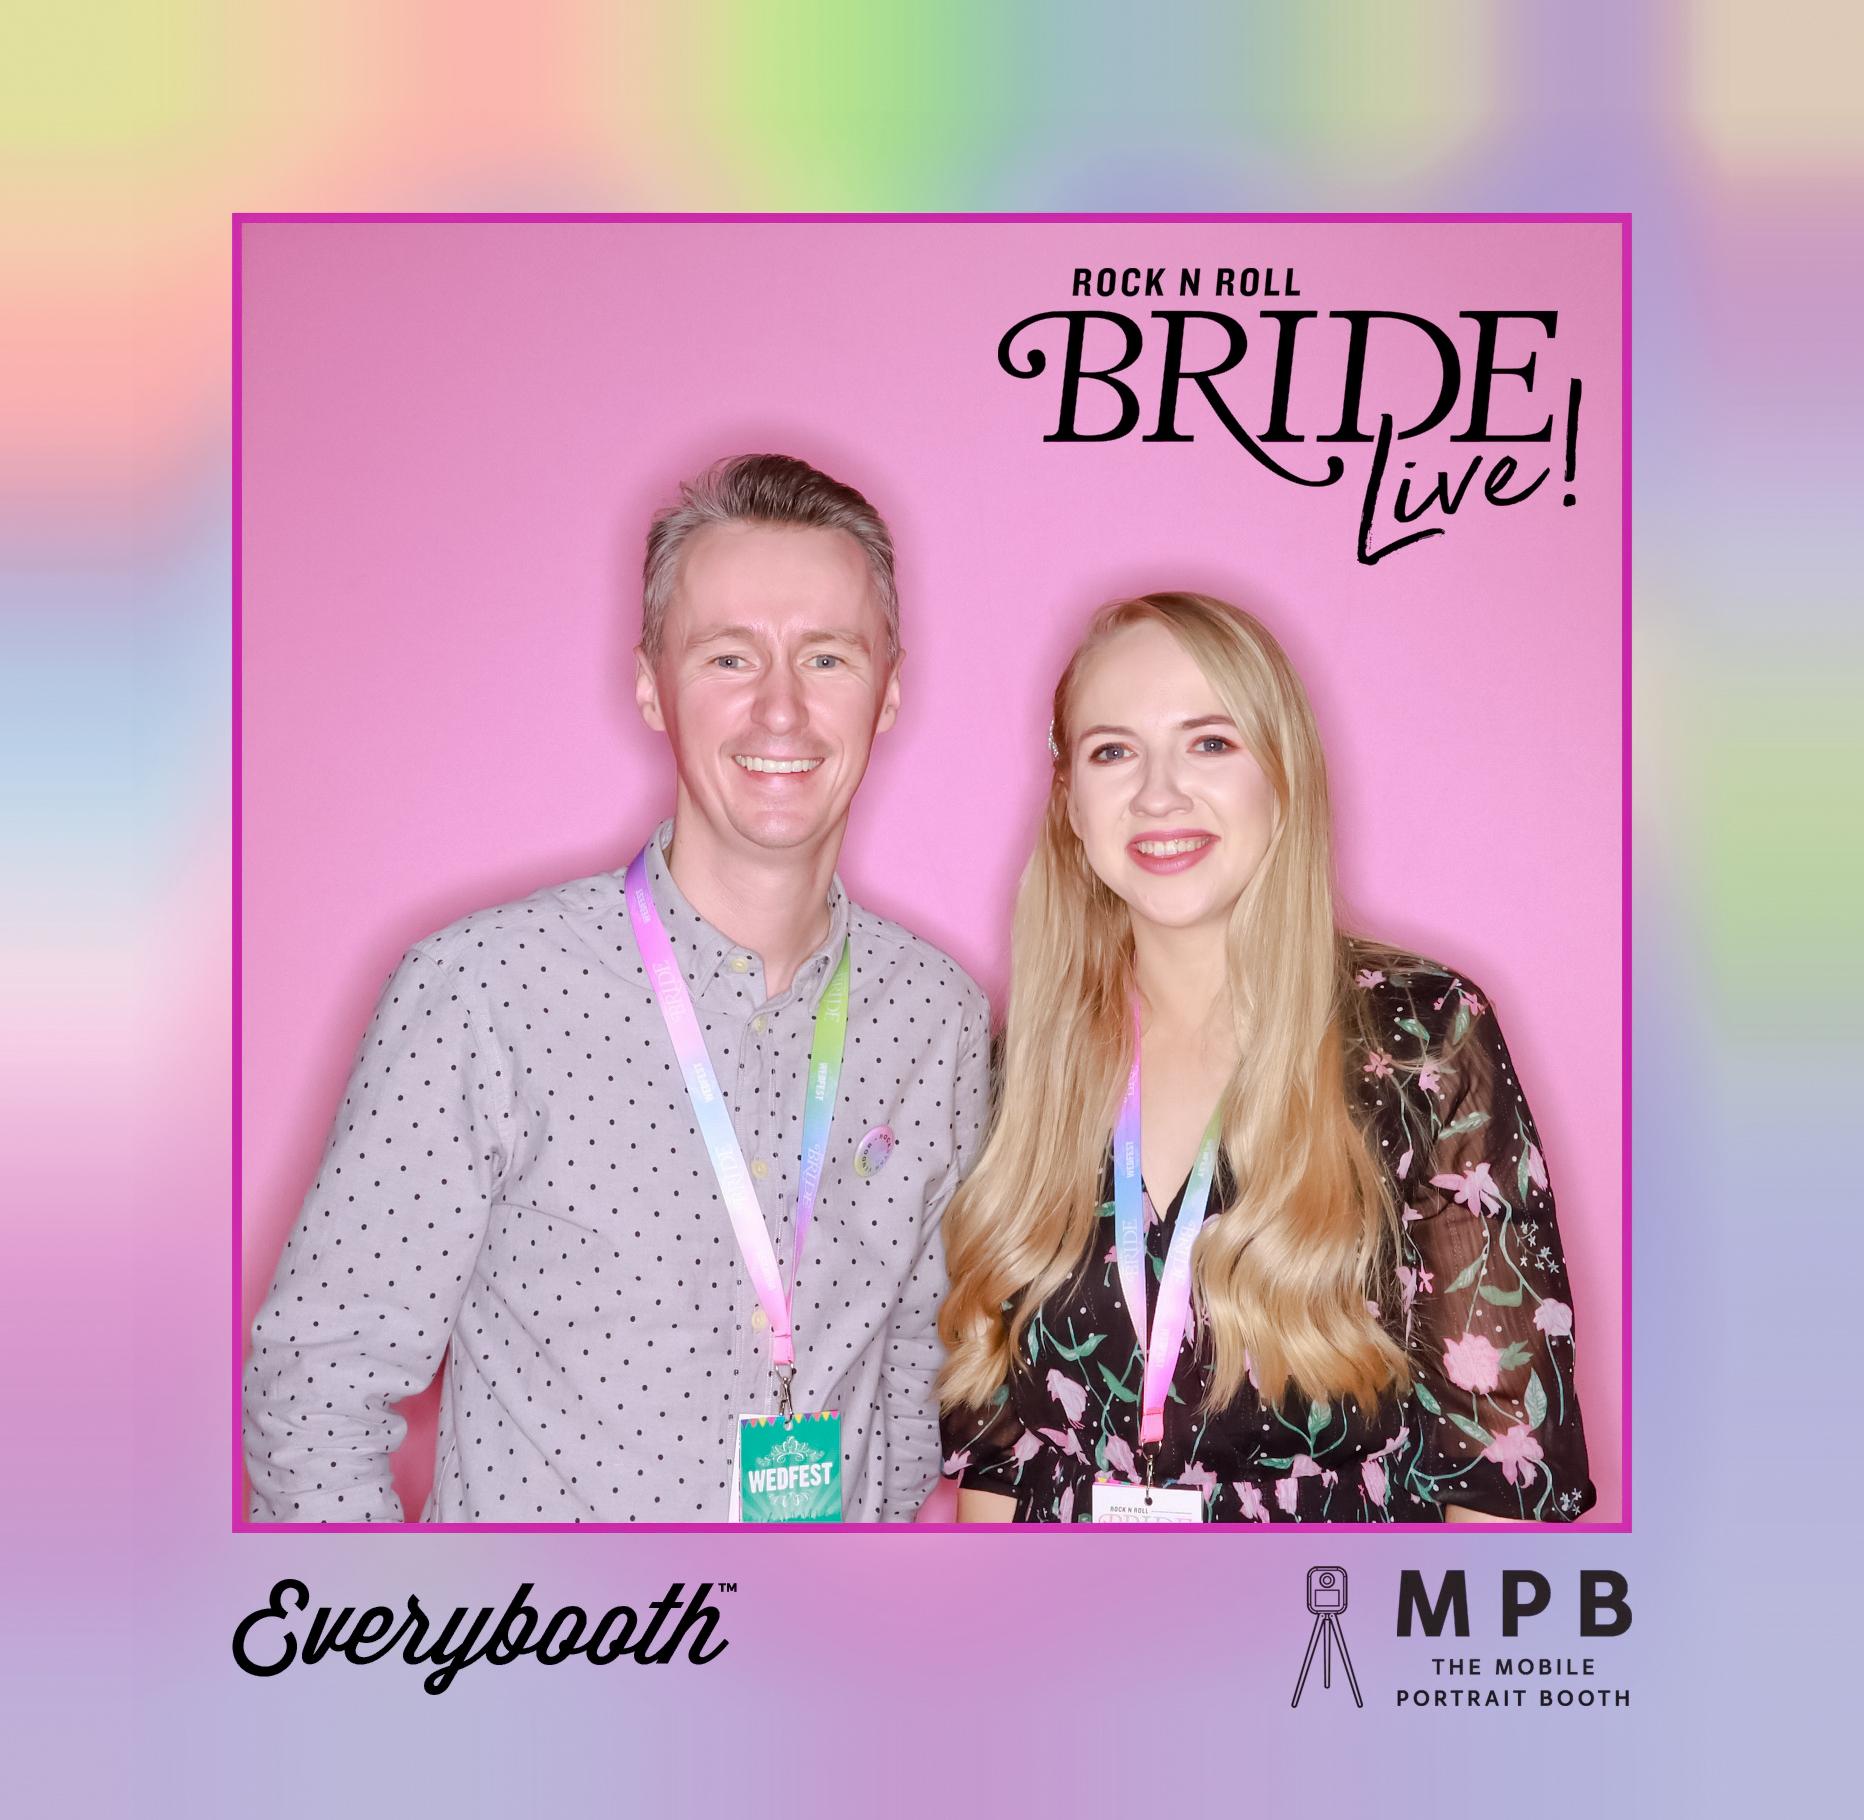 marty & christine wedfest rock n roll bride live